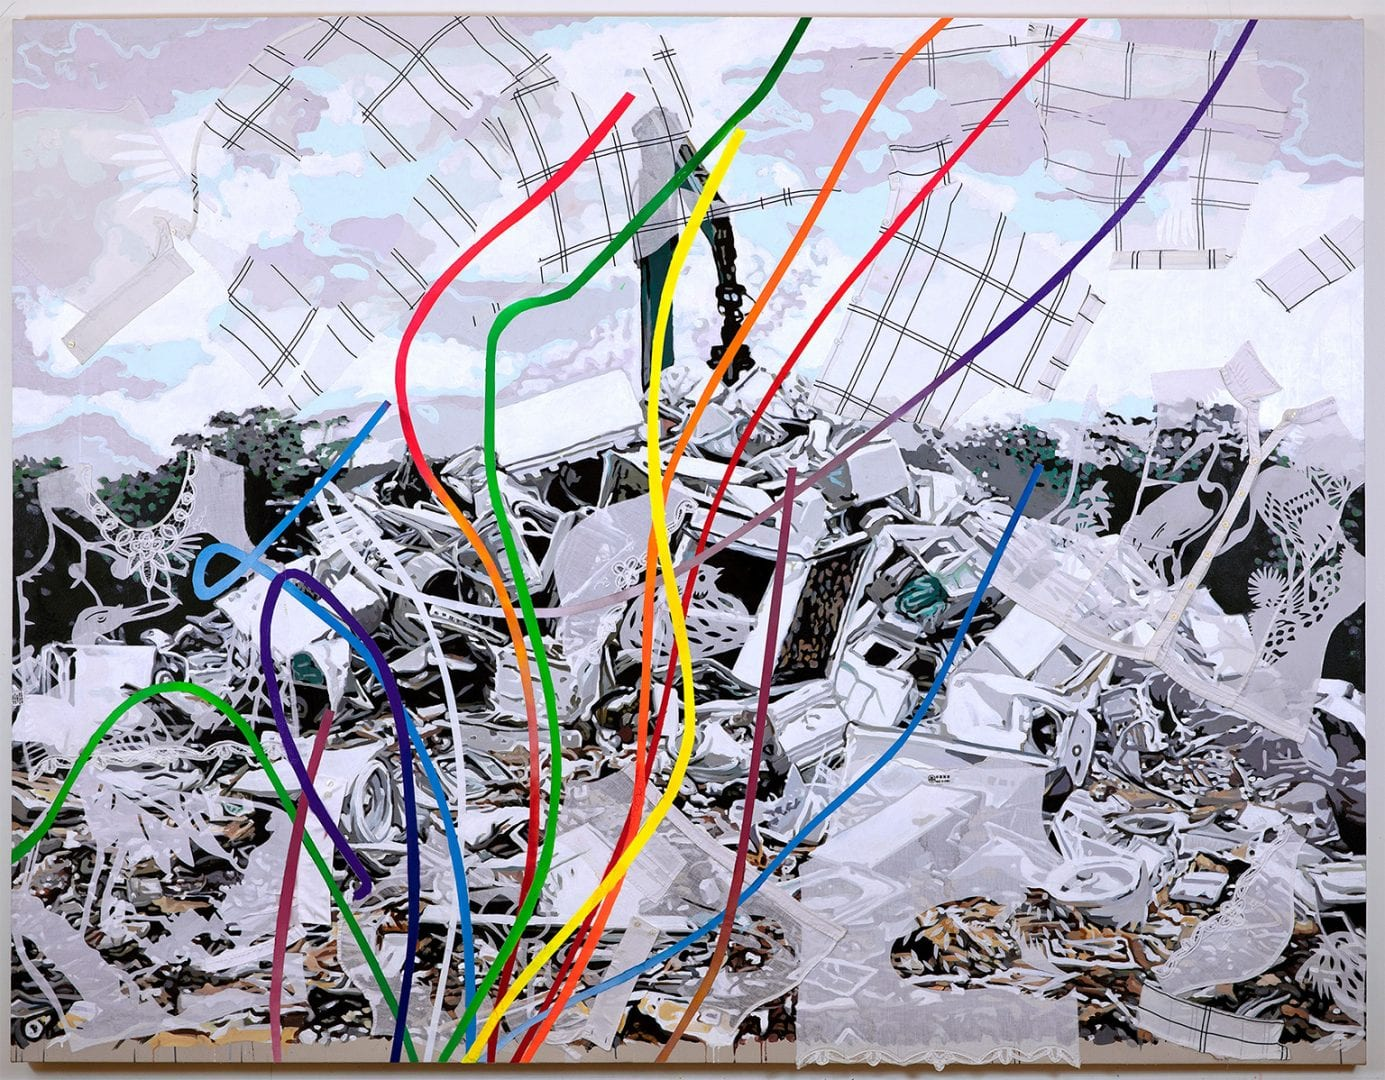 Kirk Ke Wang, Landscape of Human Skins, Gray Walls. 2016-19